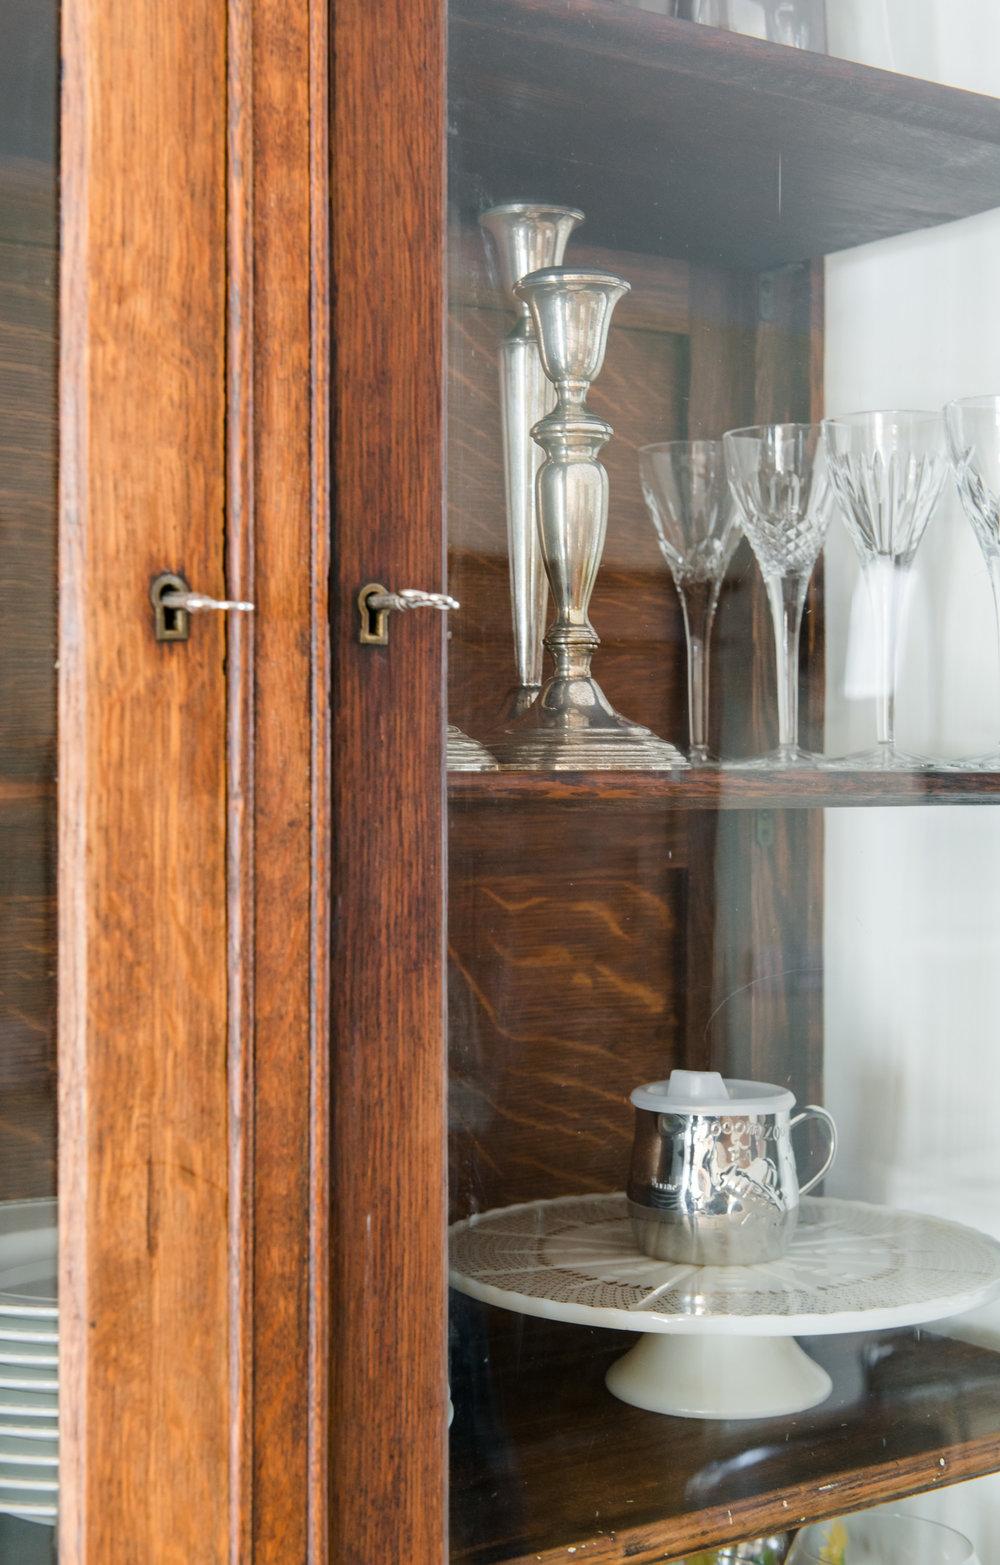 north-carolina-ave-washington-dc-dining-room-renovation-sanabria-and-co-interior-design-studio-10.jpg